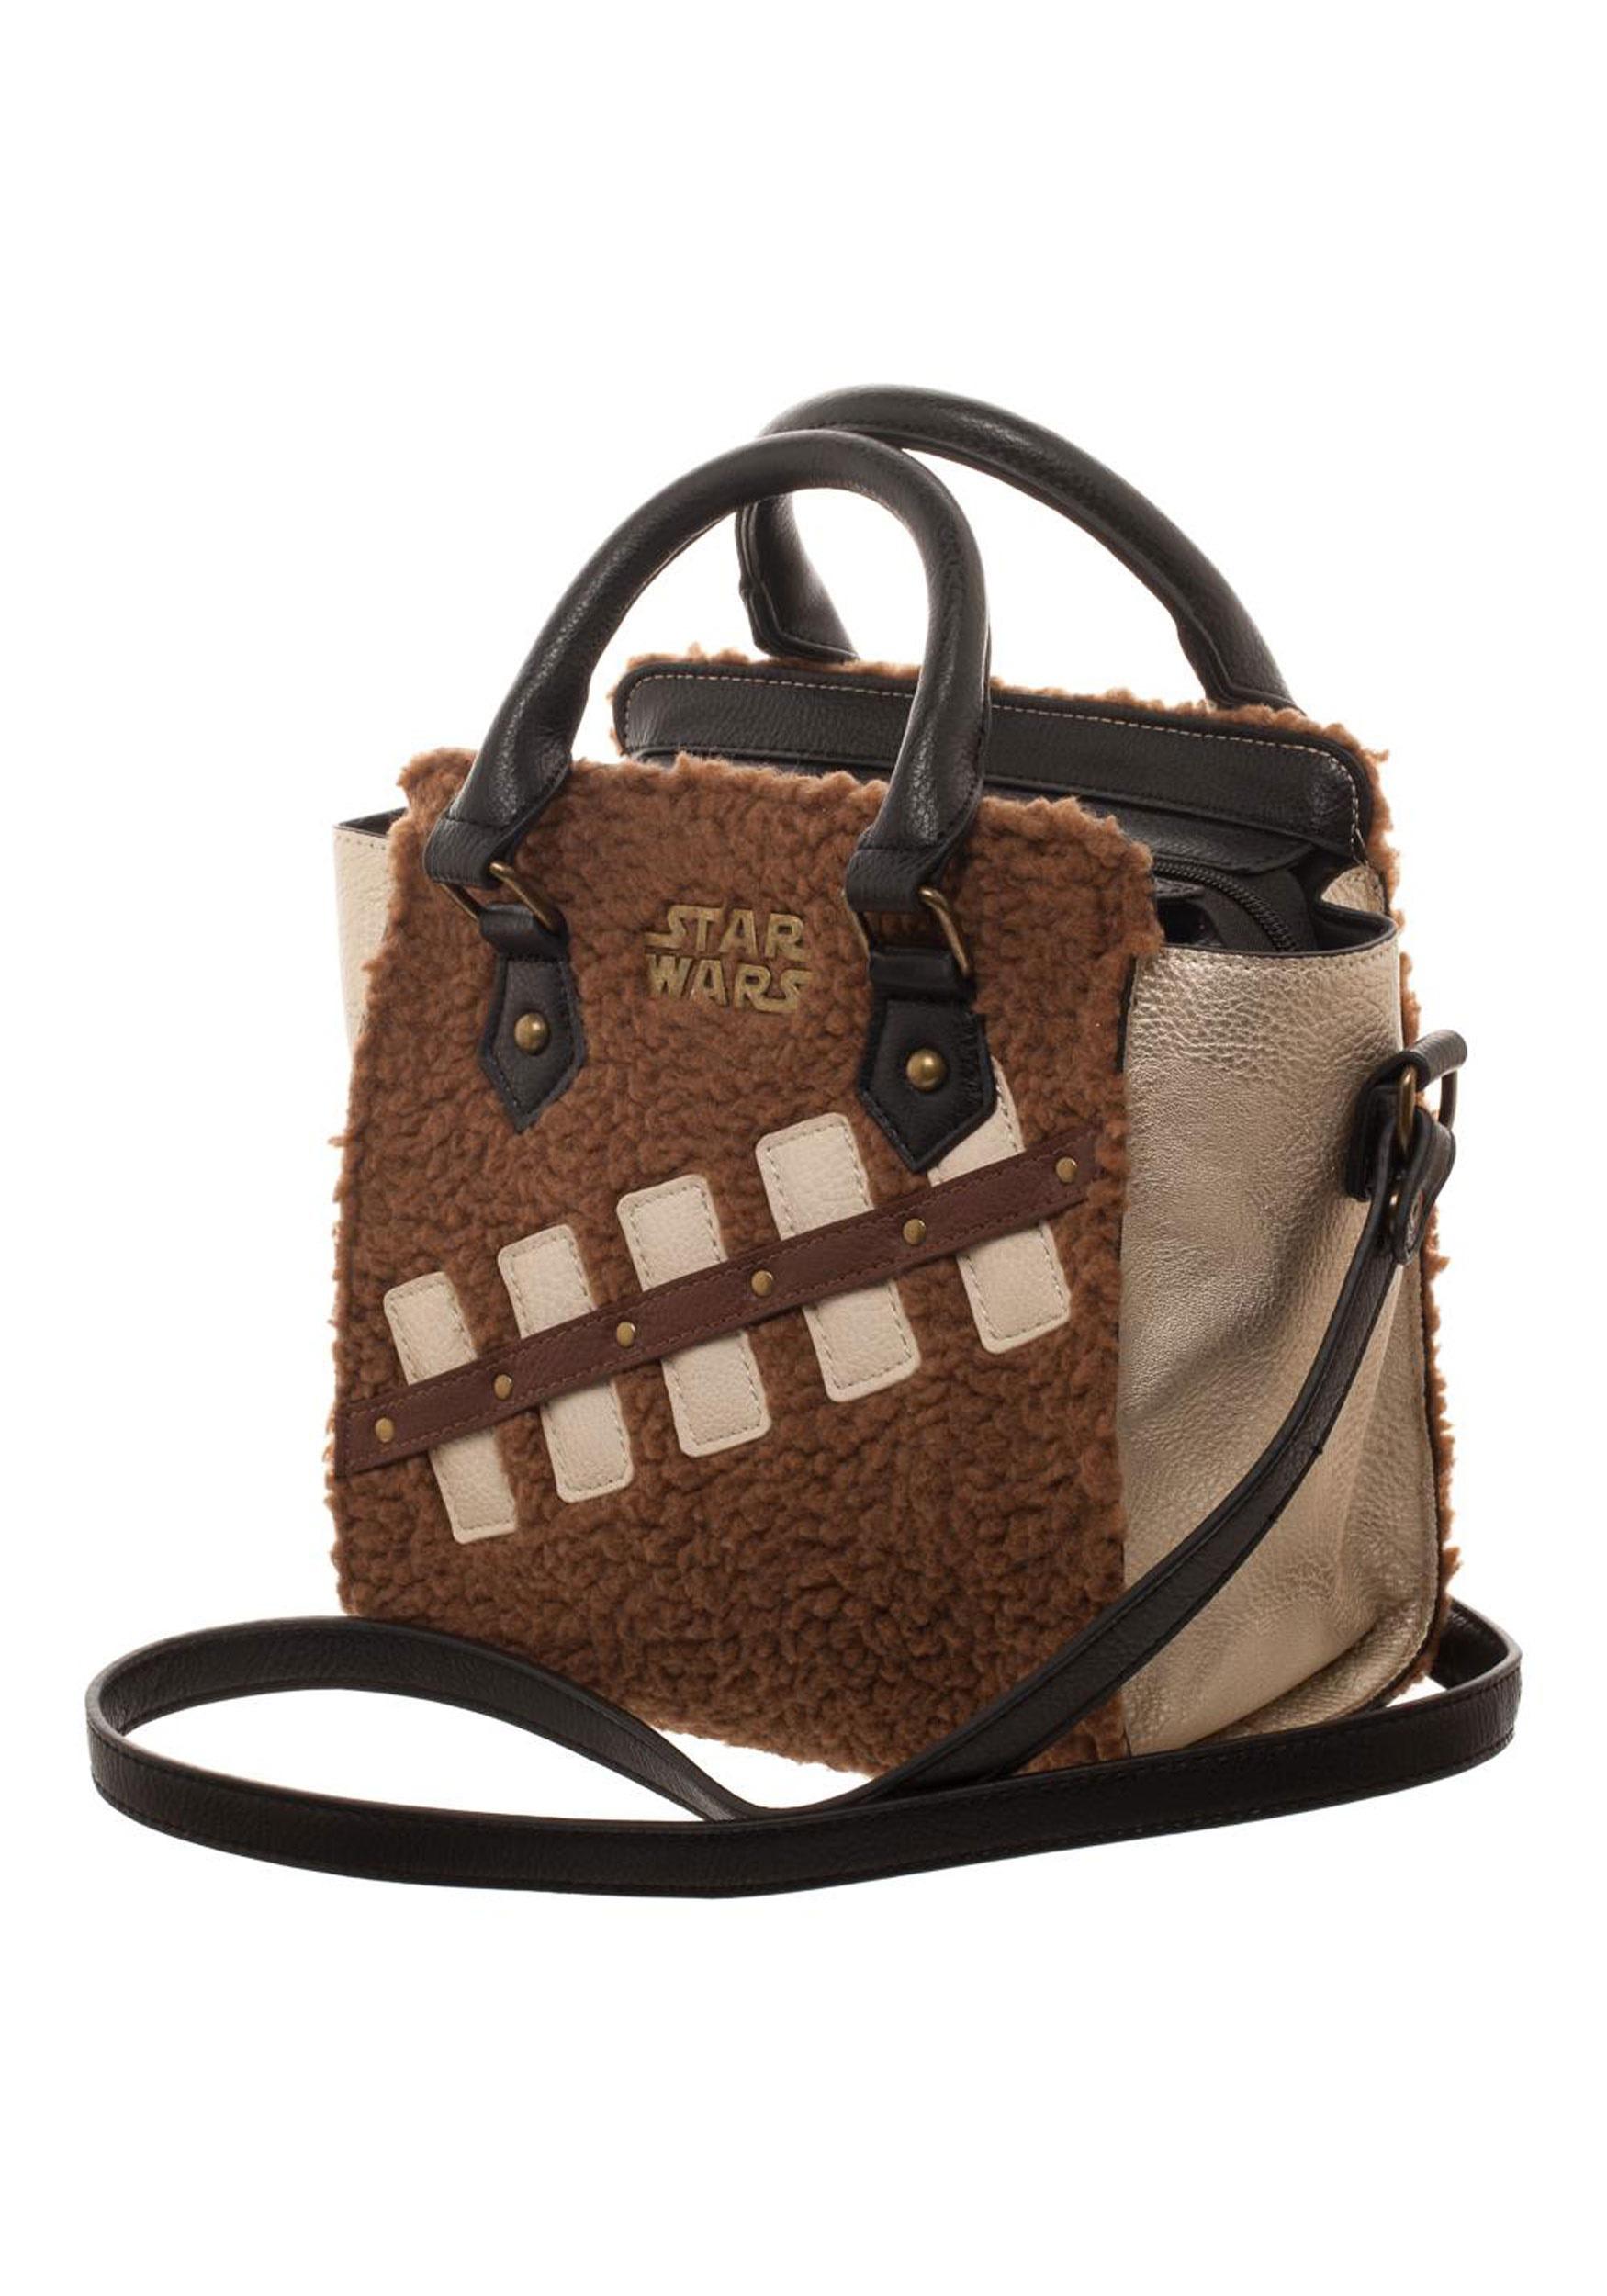 Star Wars Ep8 Chewbacca Porg Mini Handbag